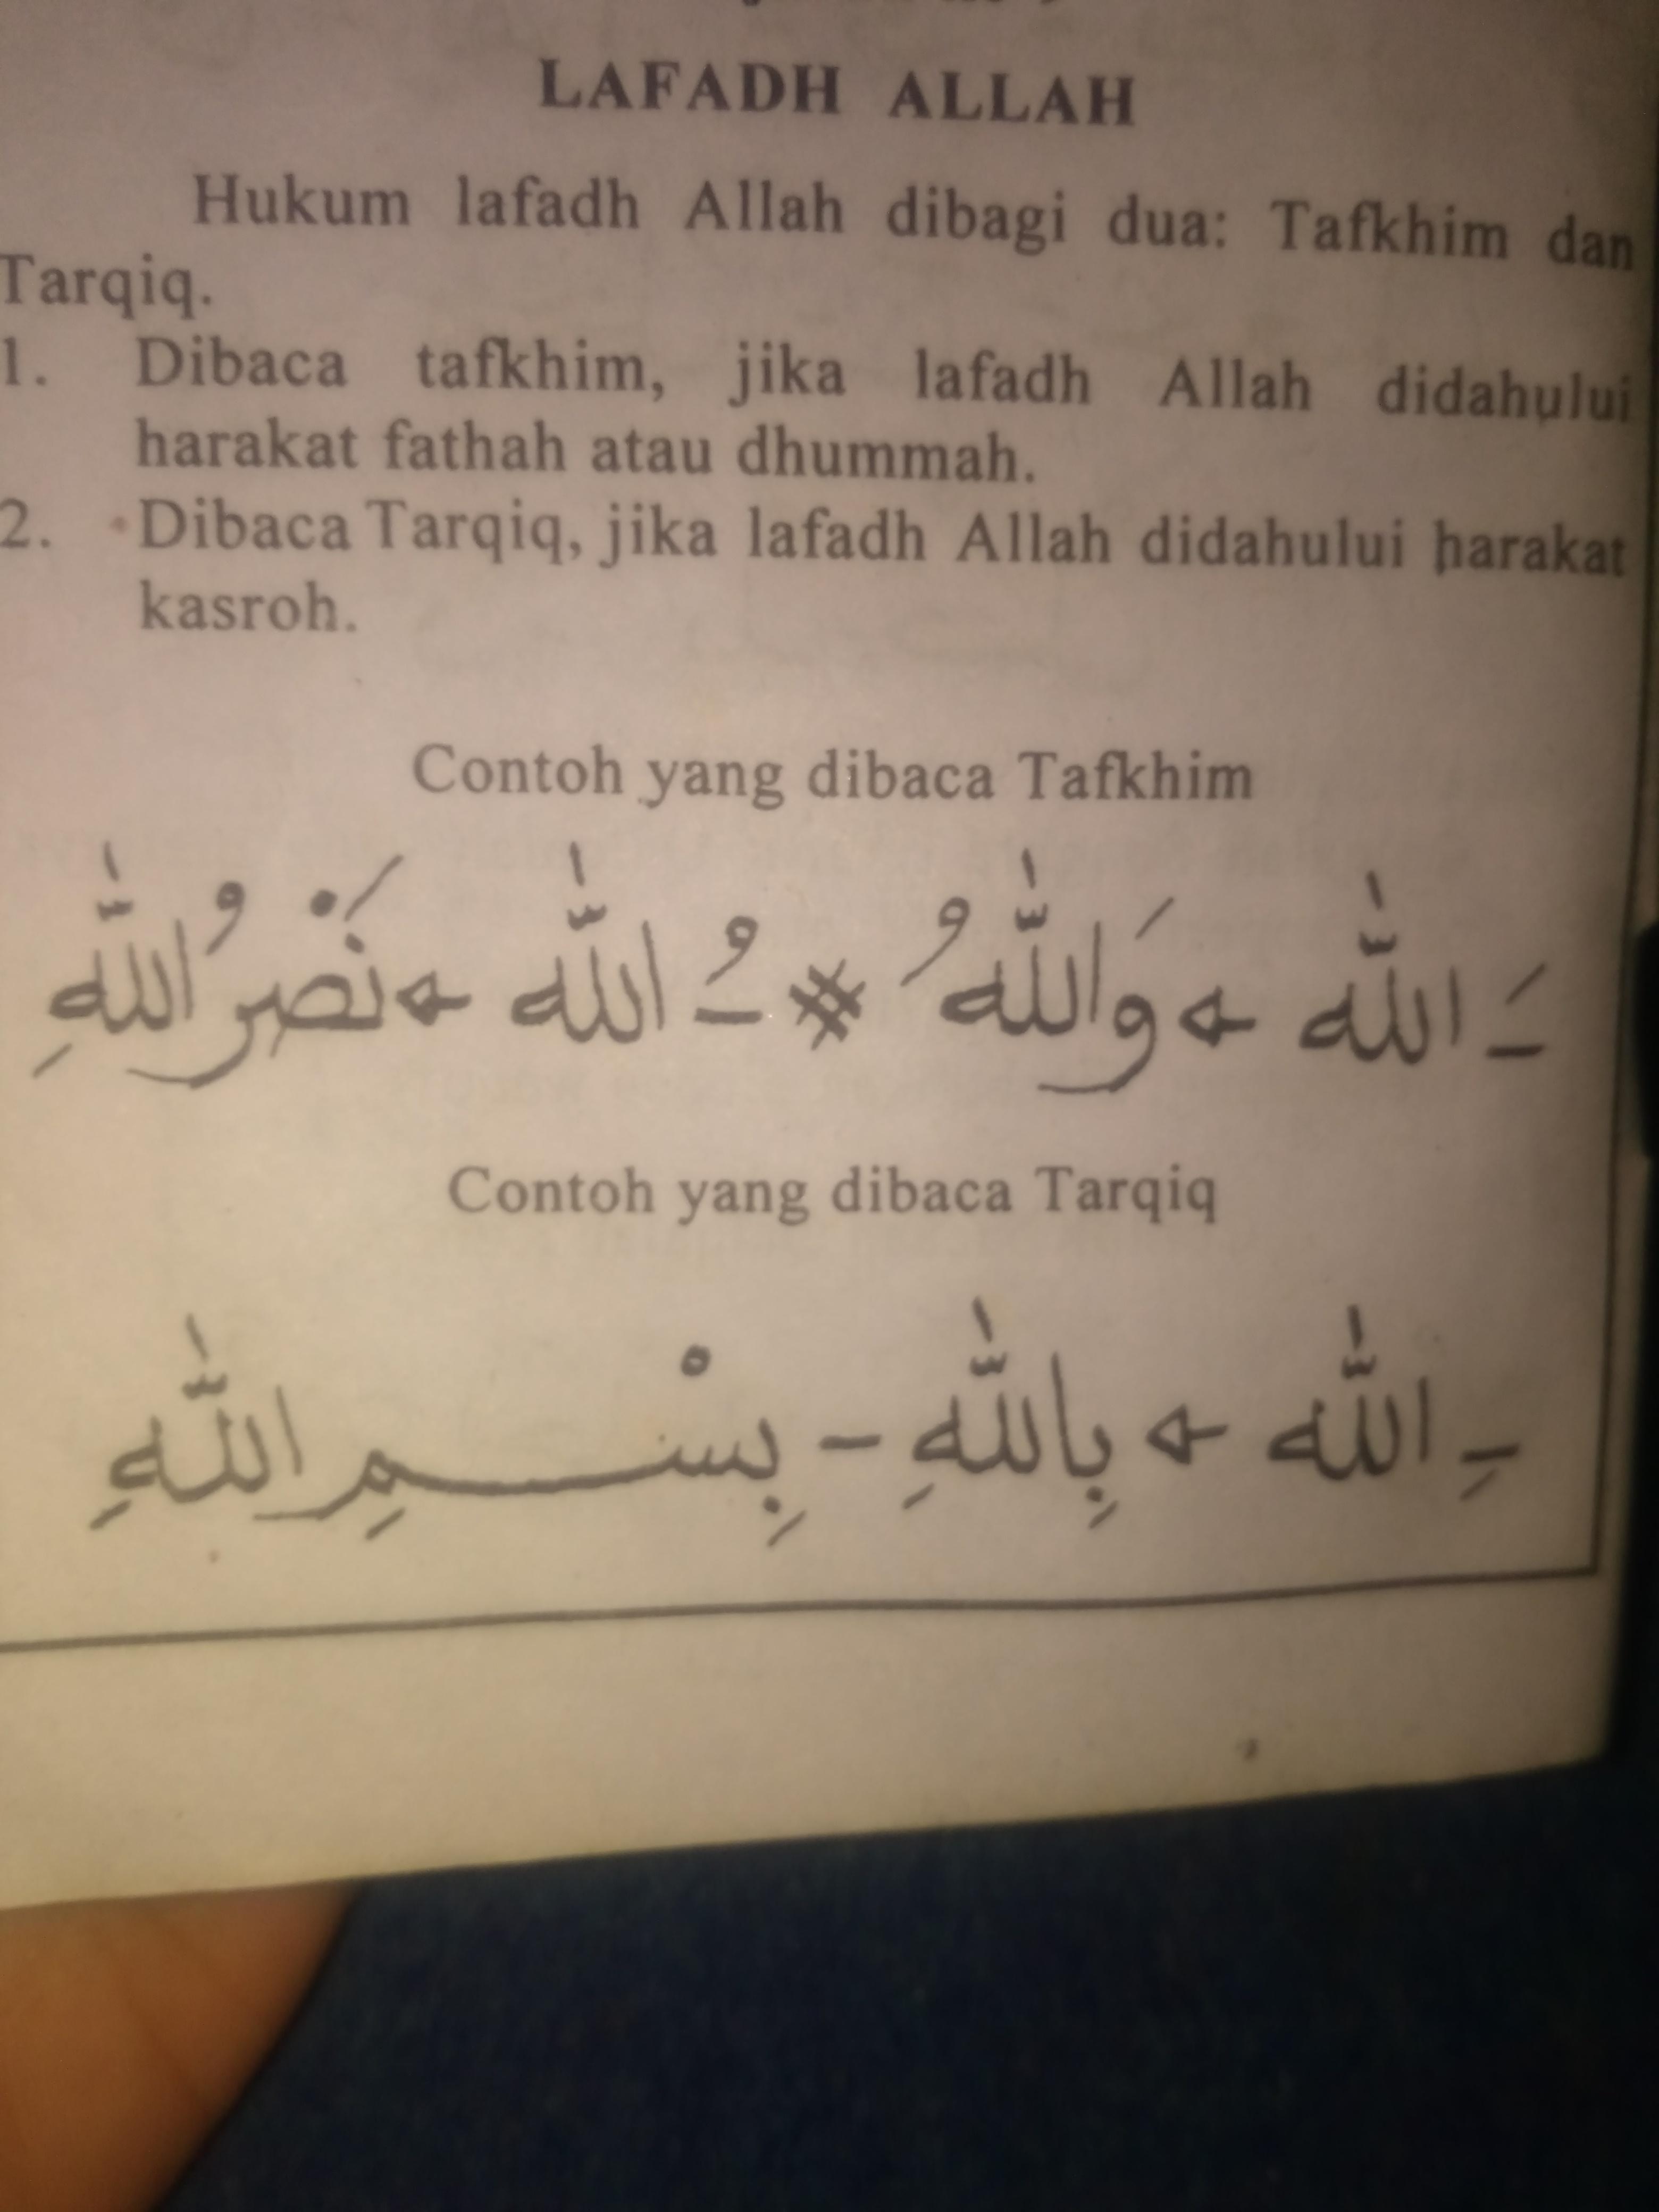 Ra Tarqiq Dan Tafkhim : tarqiq, tafkhim, Contah, Hukum, Bacaan, Tafkhim, TarQiQ, Brainly.co.id